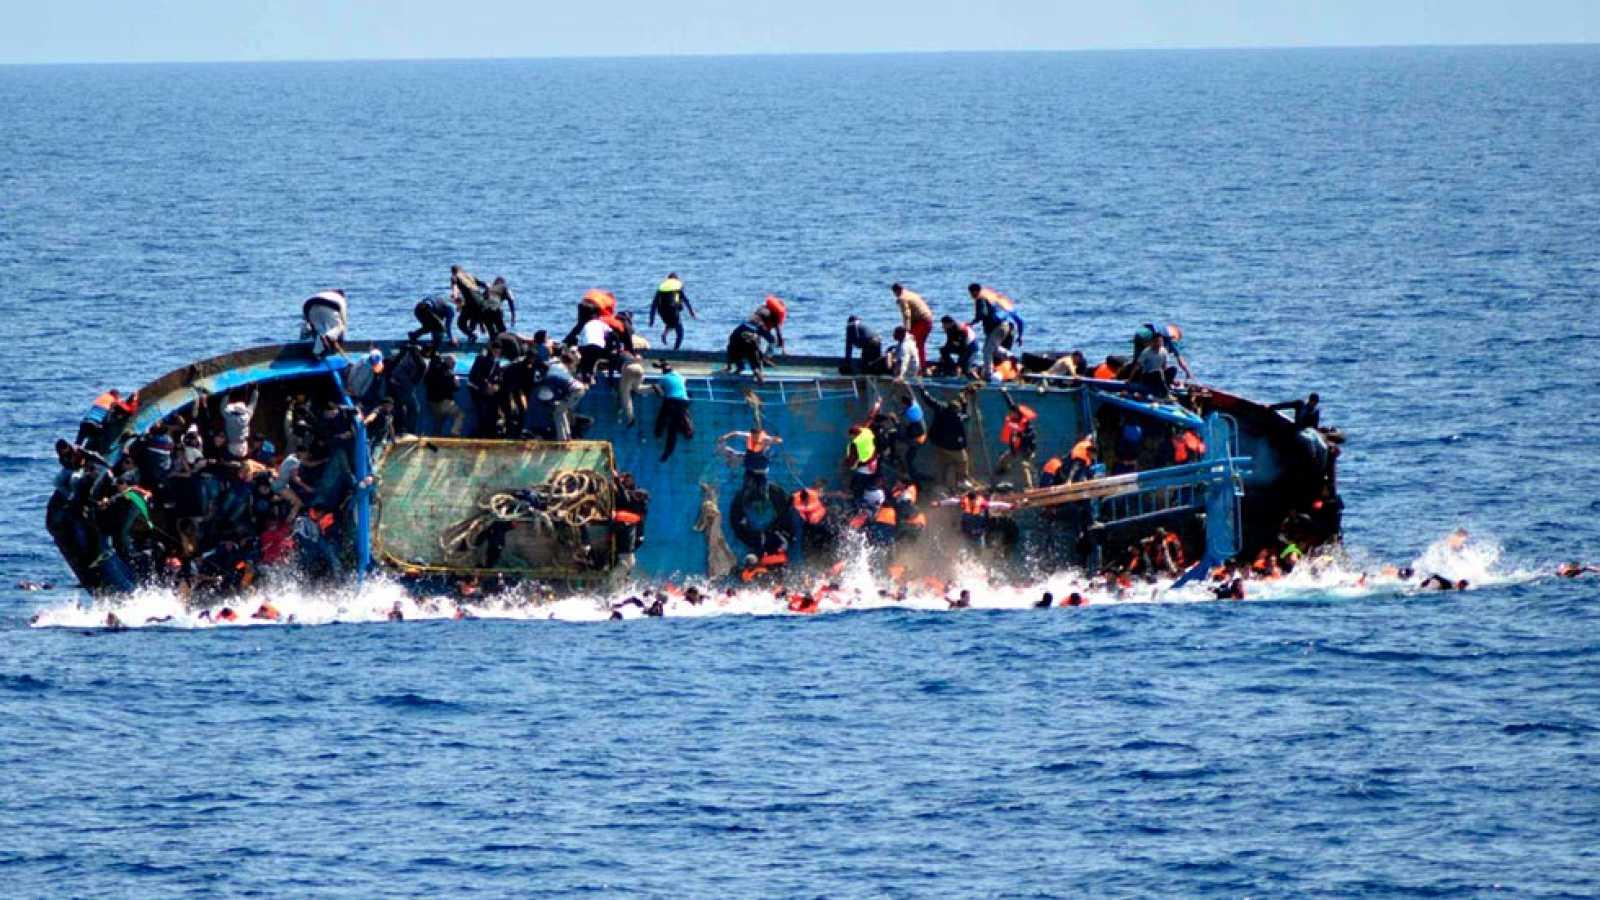 Guardacostas italianos rescataron barca con 47 migrantes que se volcó cerca de Lampedusa